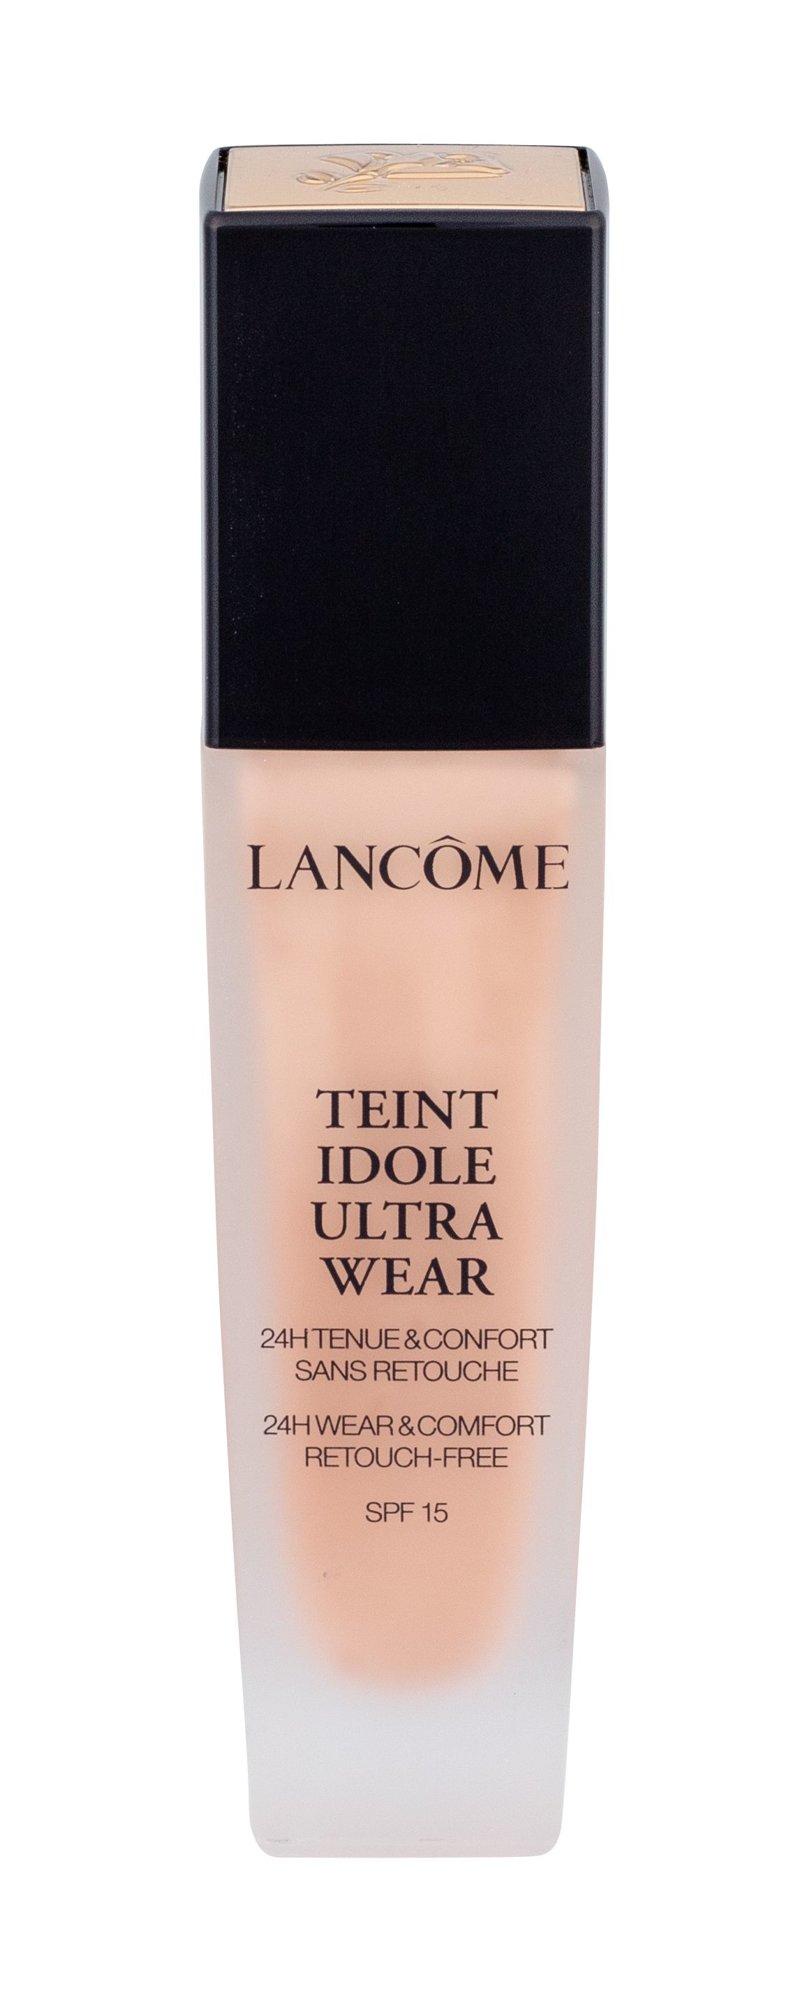 Lancôme Teint Idole Ultra Wear Cosmetic 30ml 02 Lys Rose